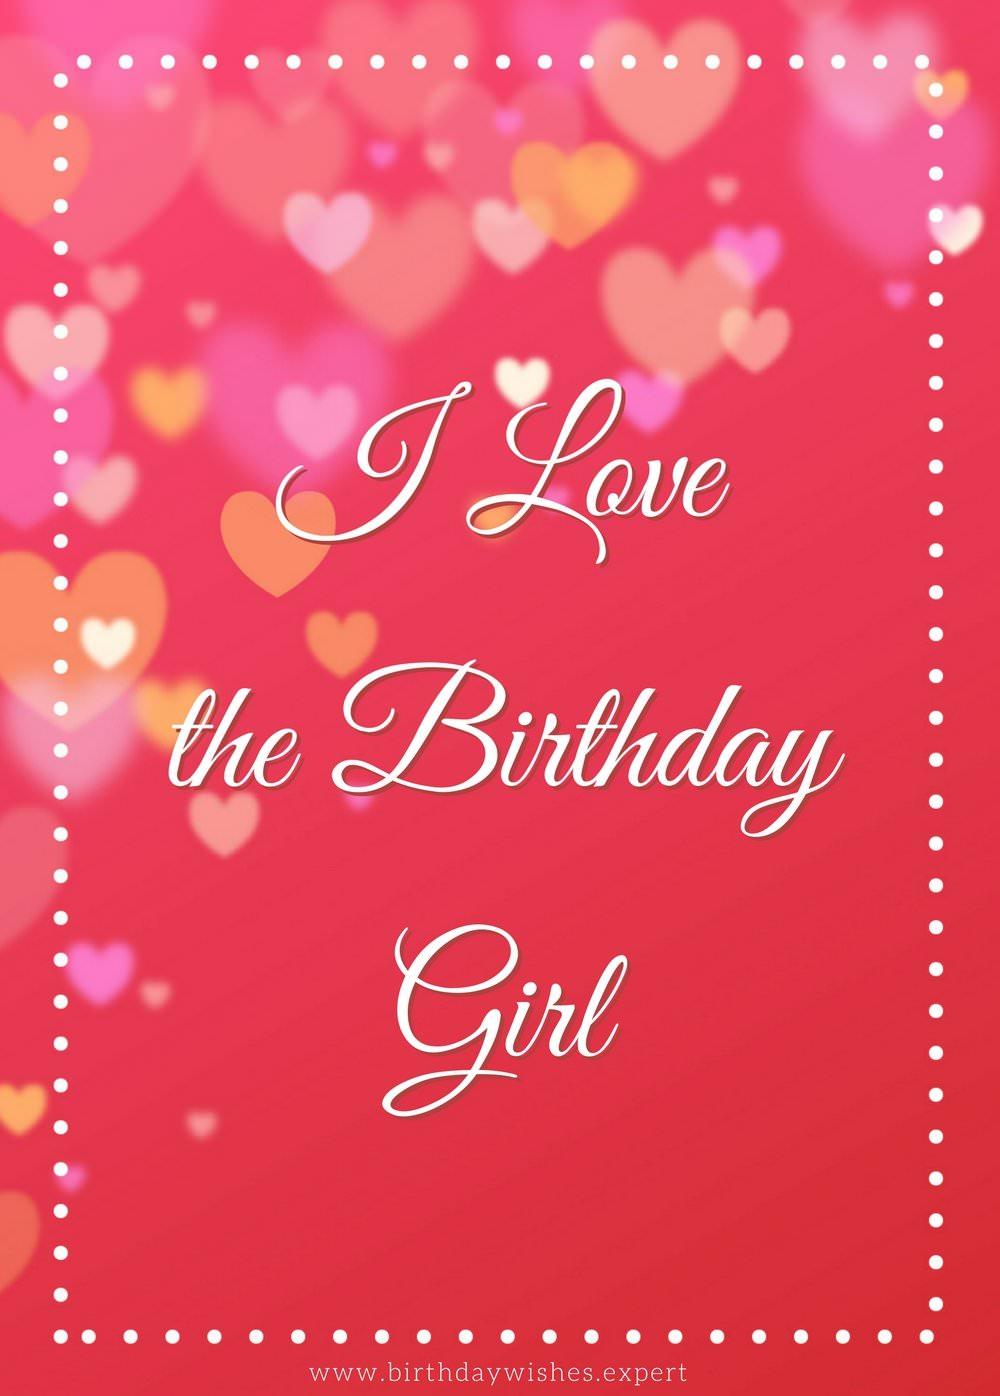 Lovely Birthday Messages For Girlfriend Pinterest thumbnail